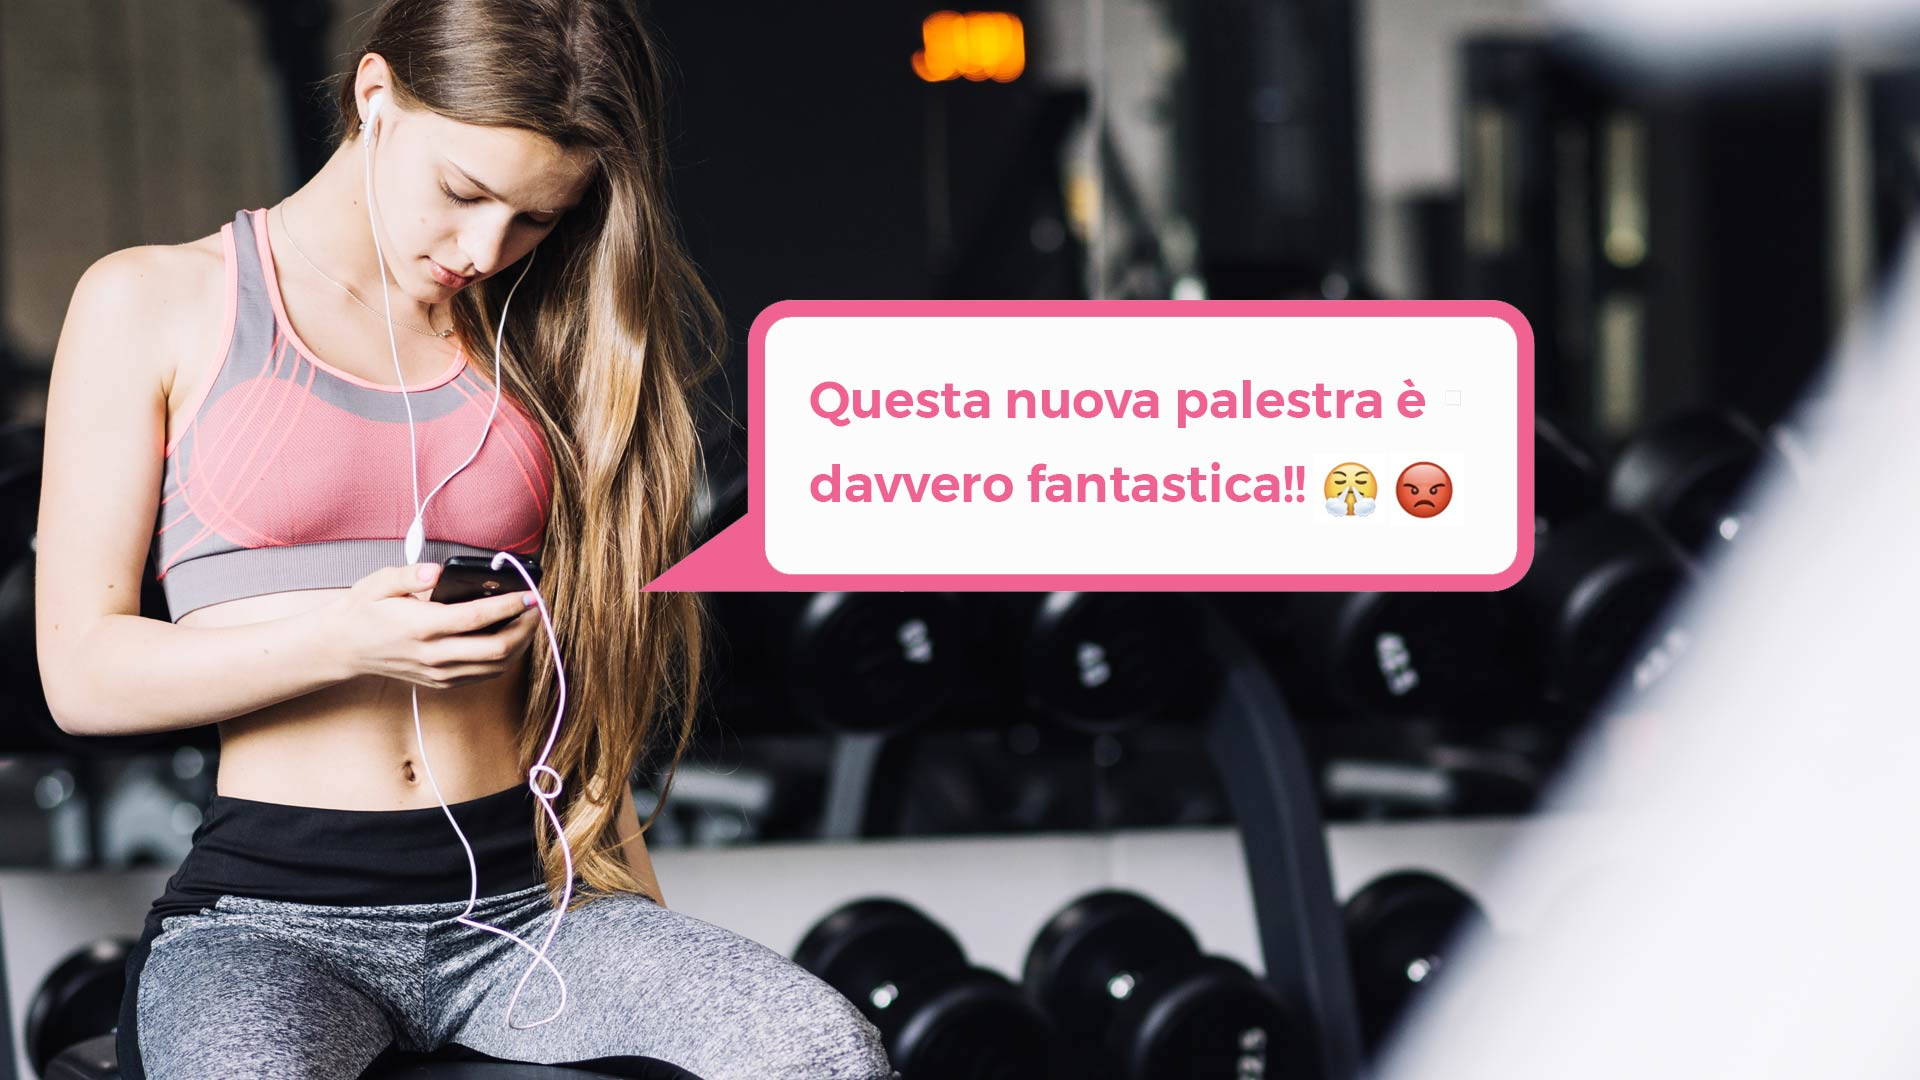 Woman-gym-mobile-phone-emoji-ironic